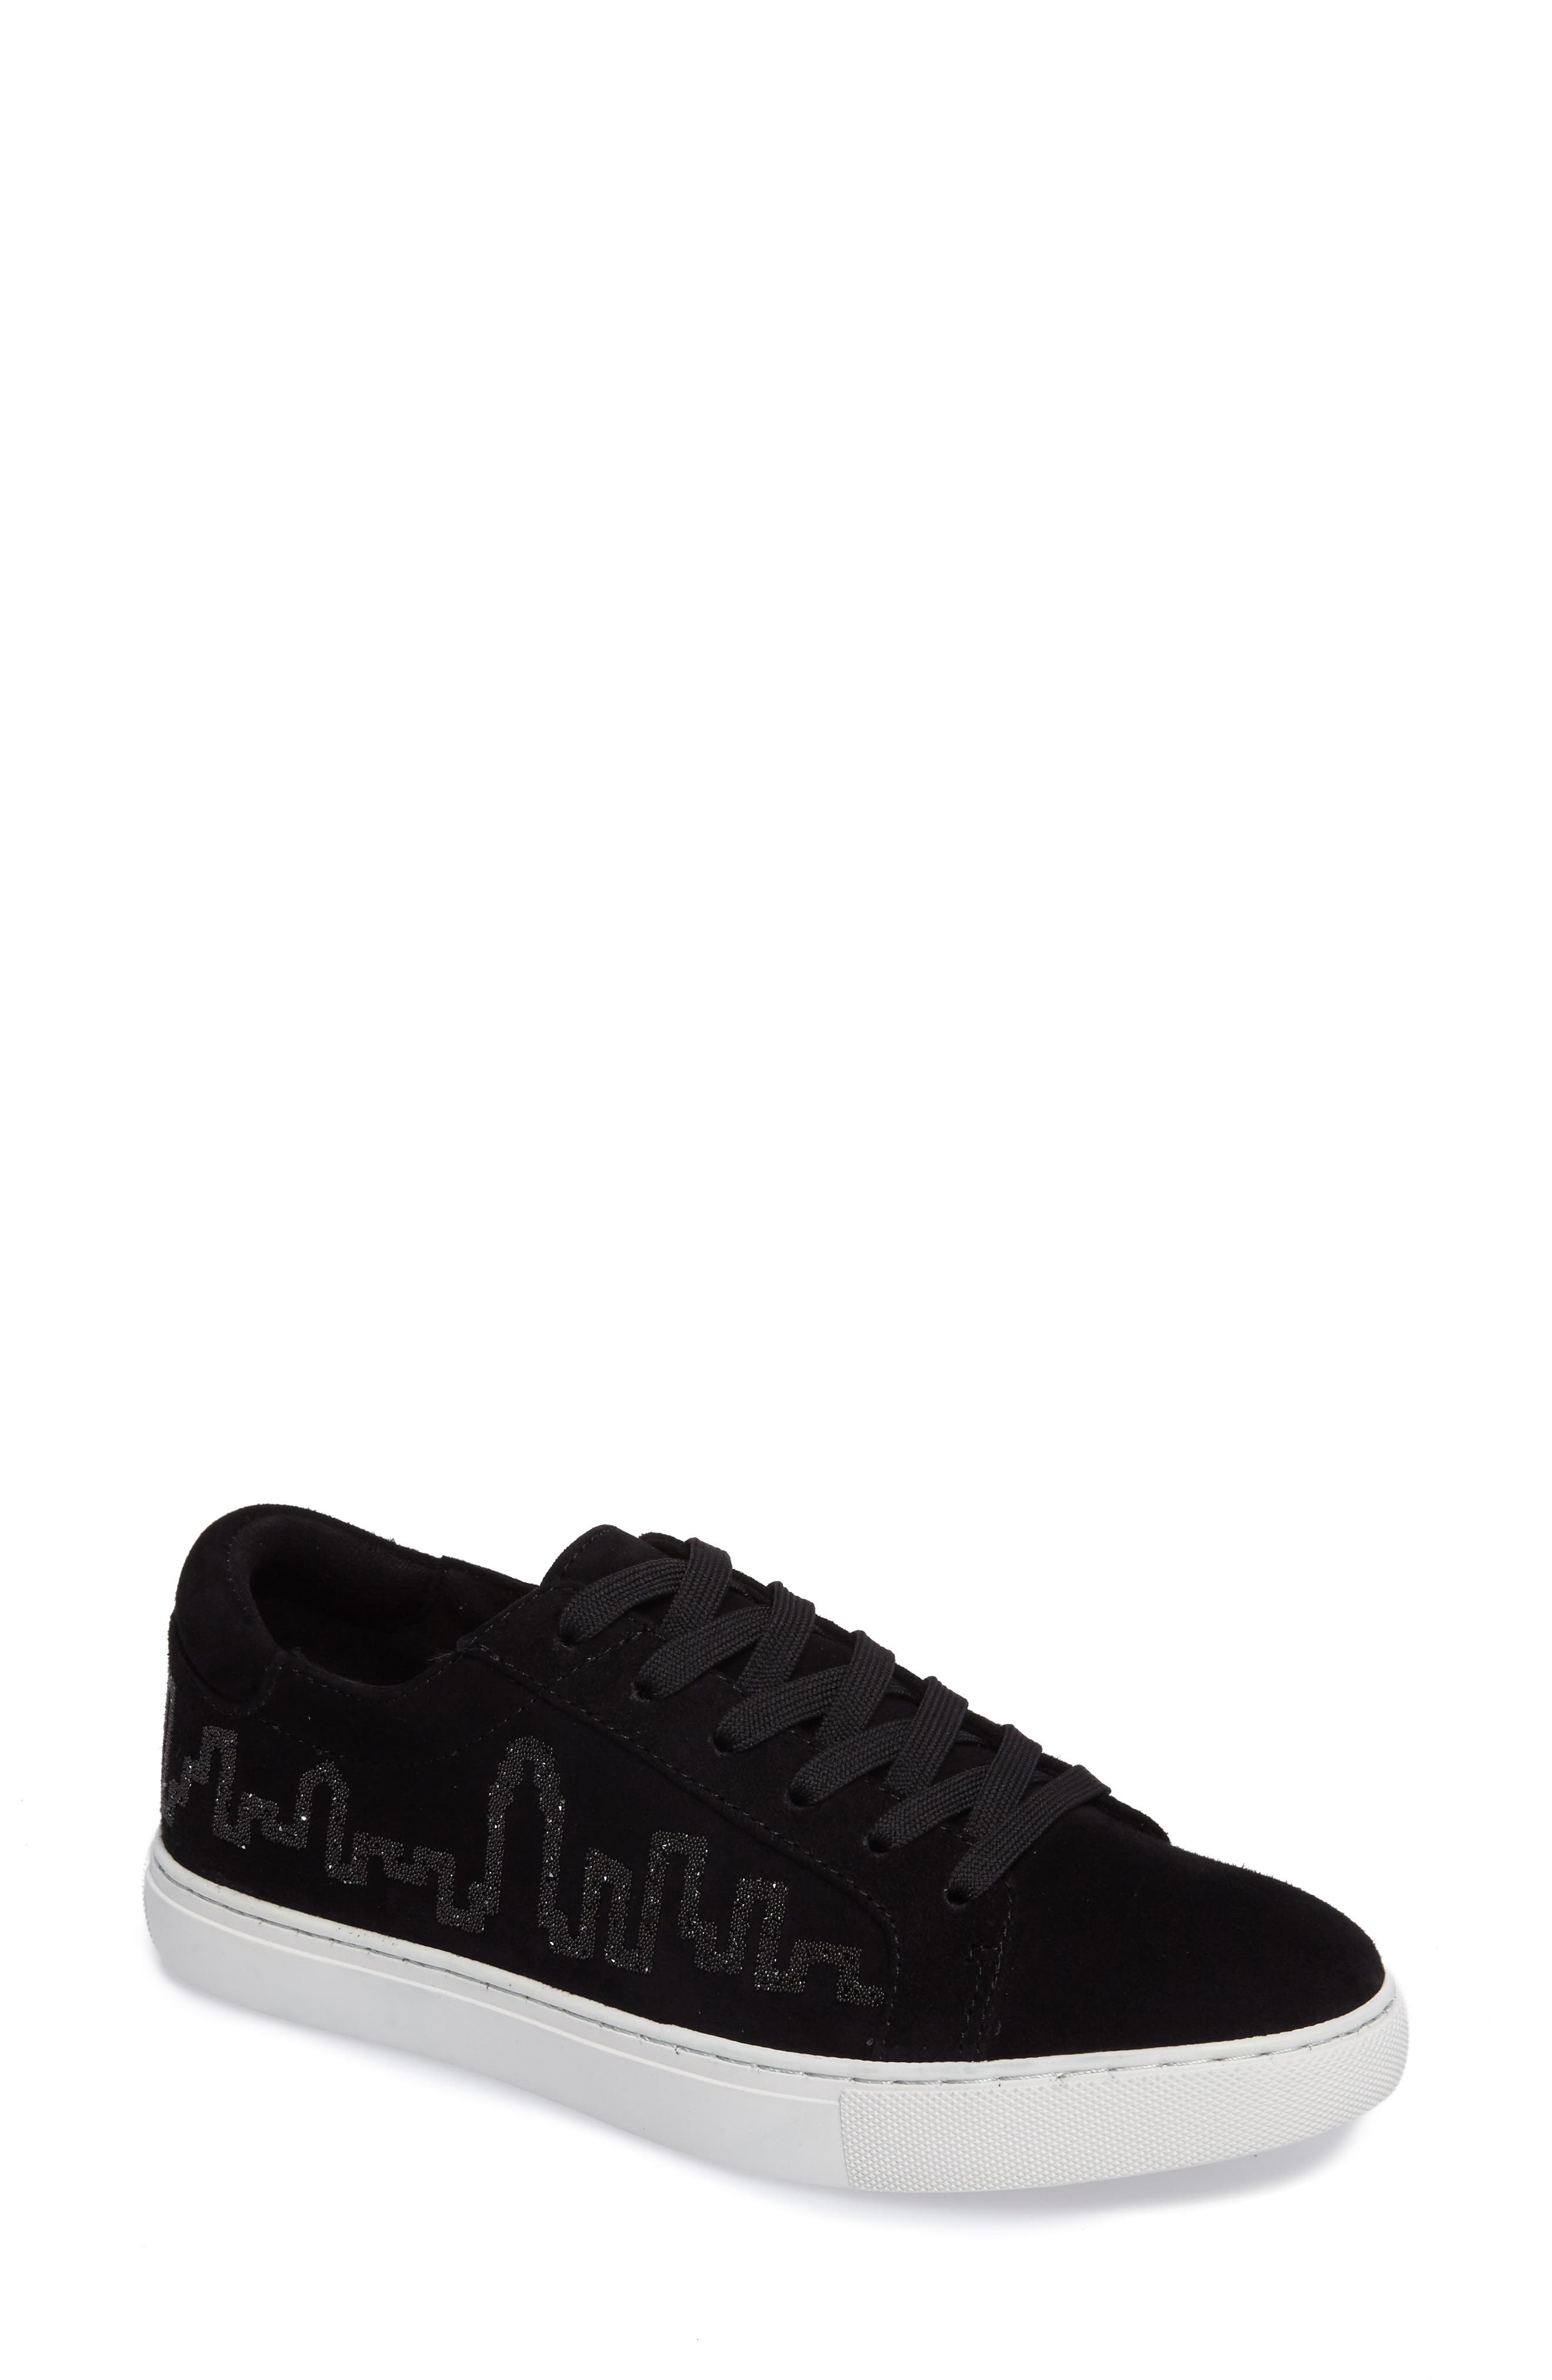 Main Image - Kenneth Cole New York Kam Sky Techni-Cole™ Sneaker (Women)